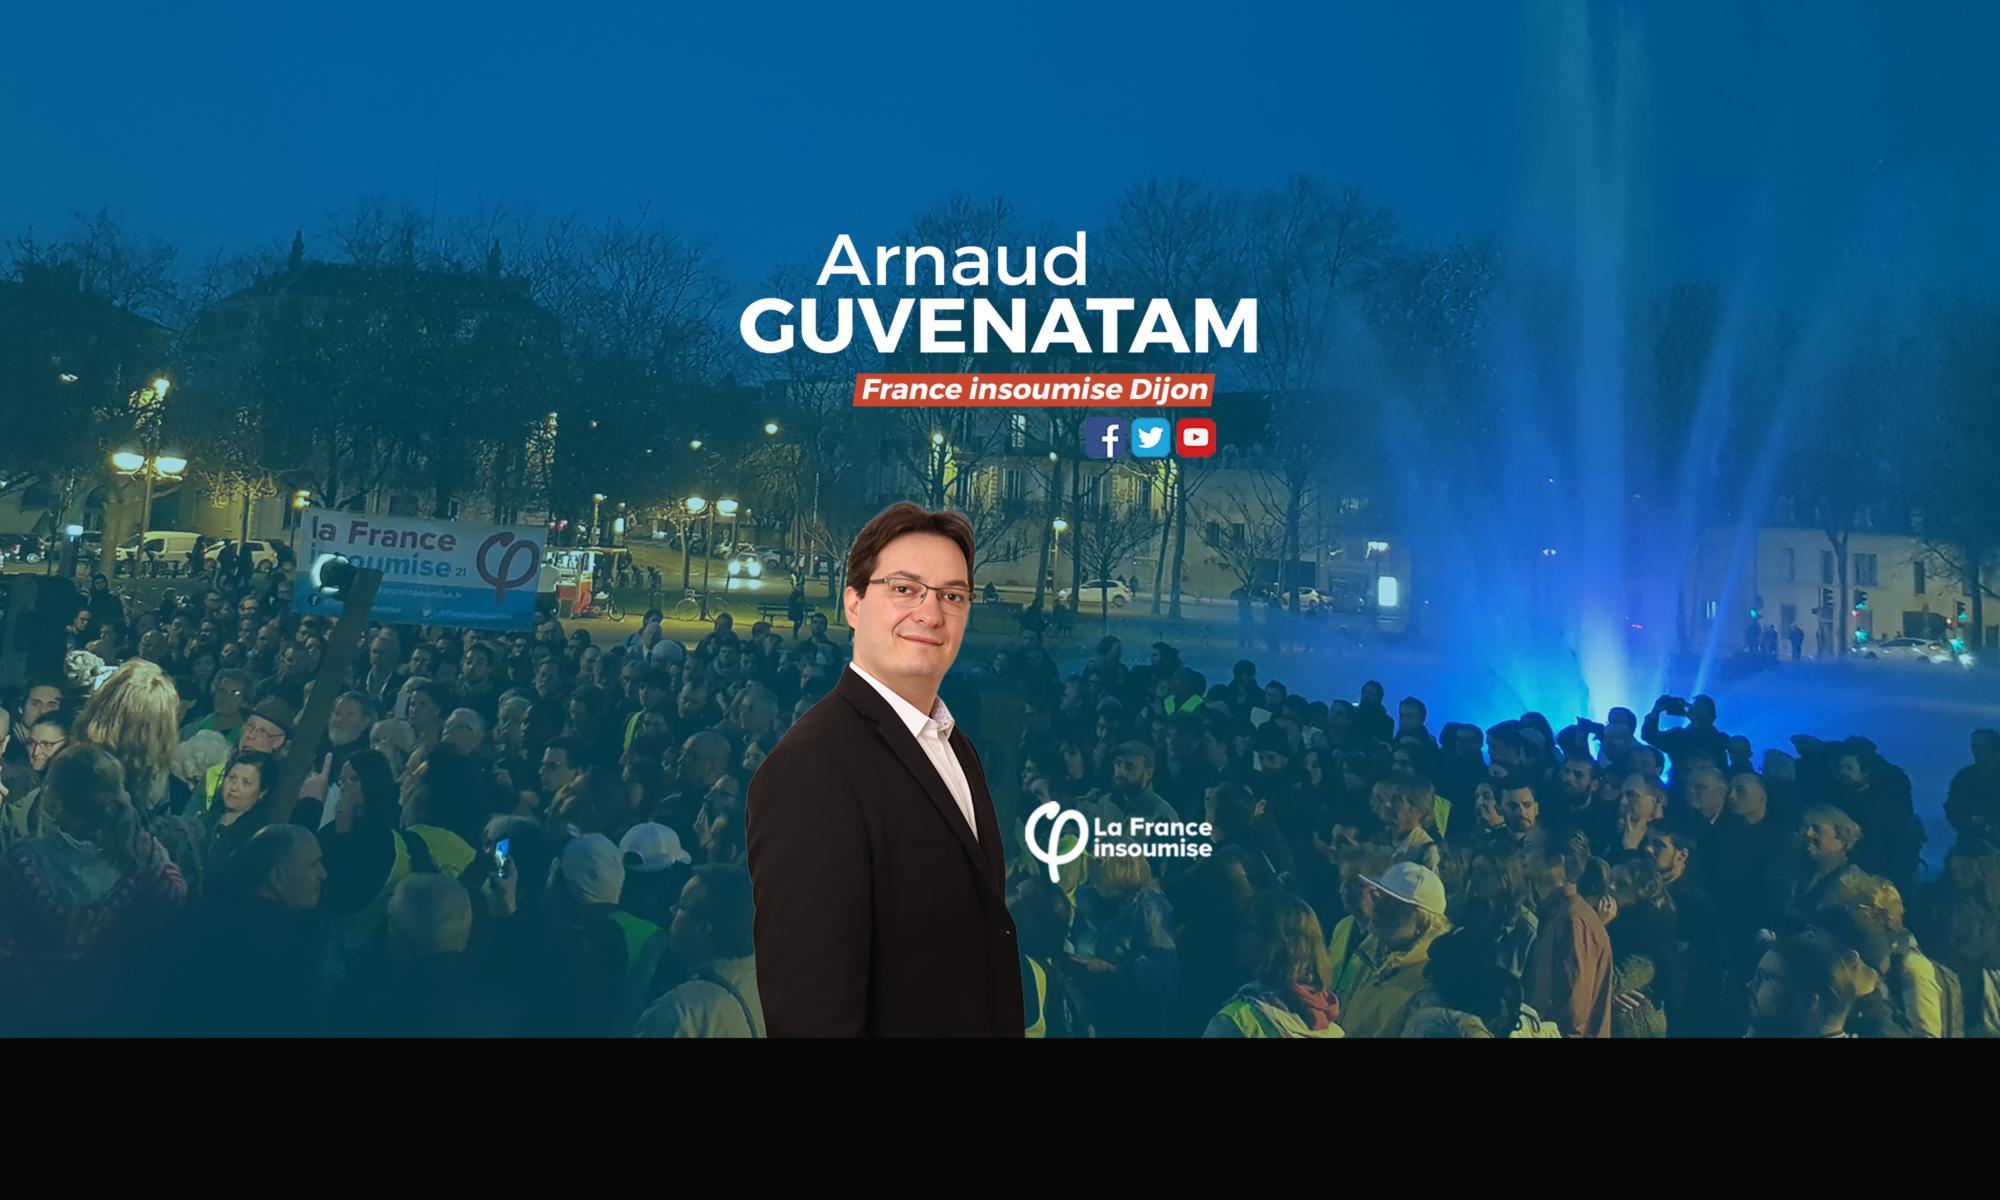 Arnaud Guvenatam